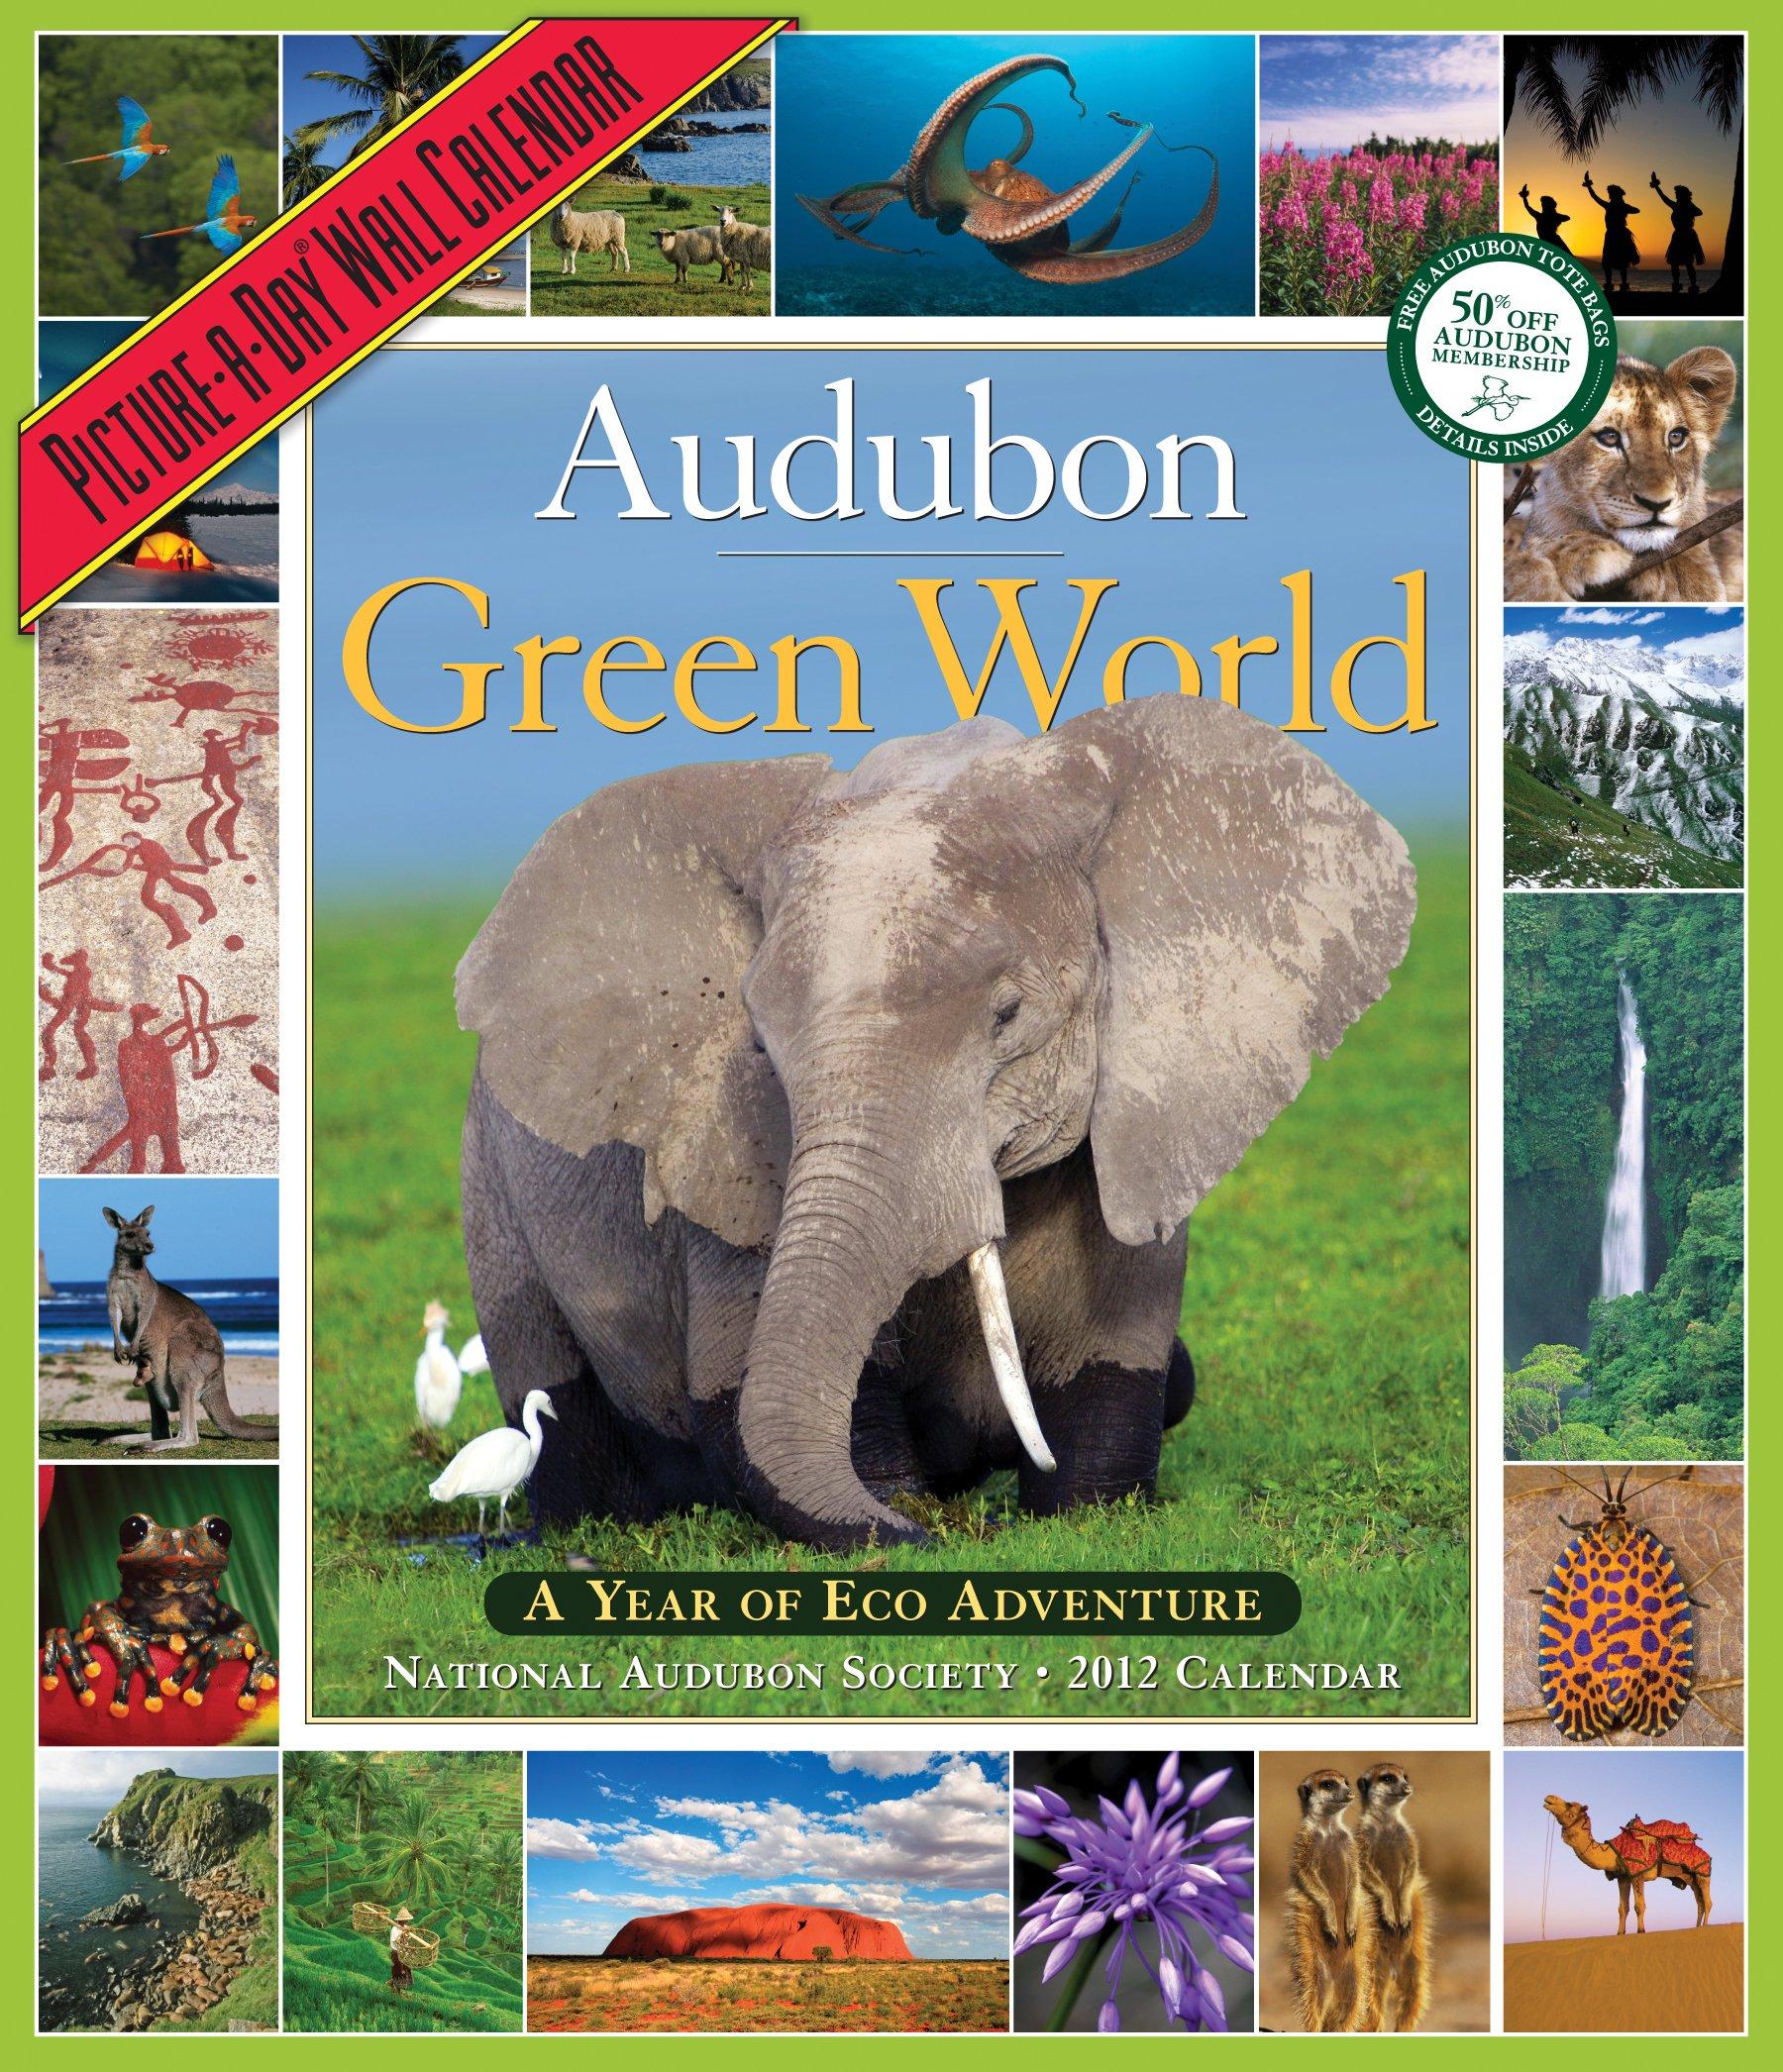 Audubon Green World Calendar Picture product image